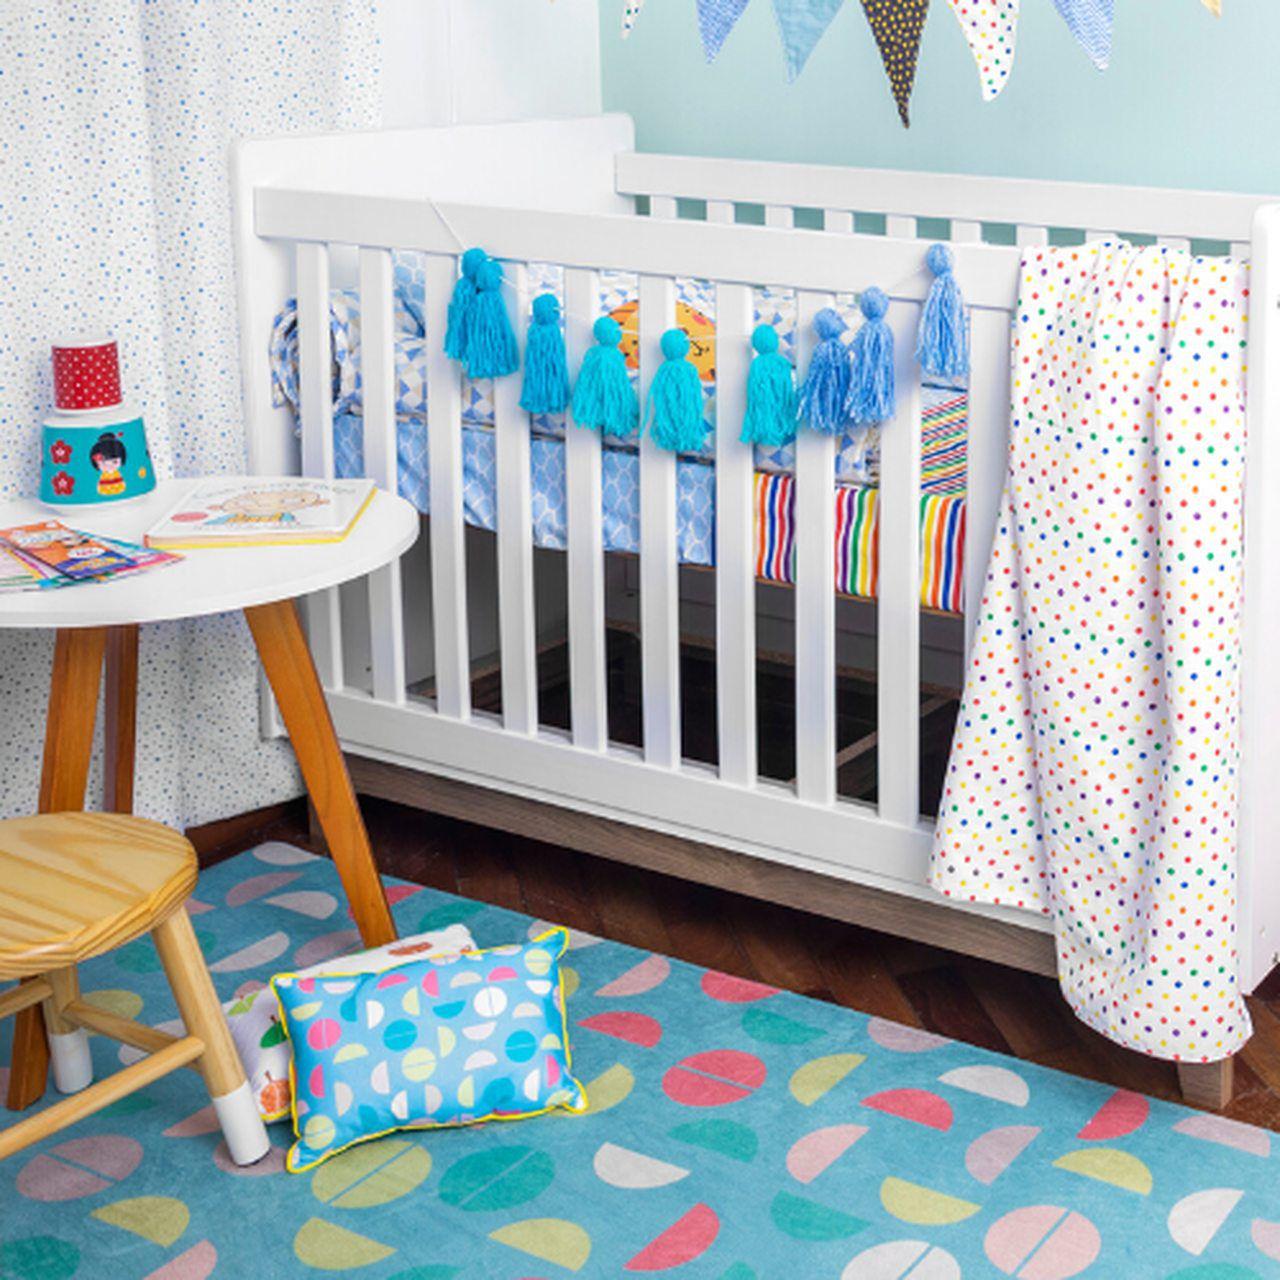 Tapete quarto infantil estampa Colorball Azul  - Pomelo Decor